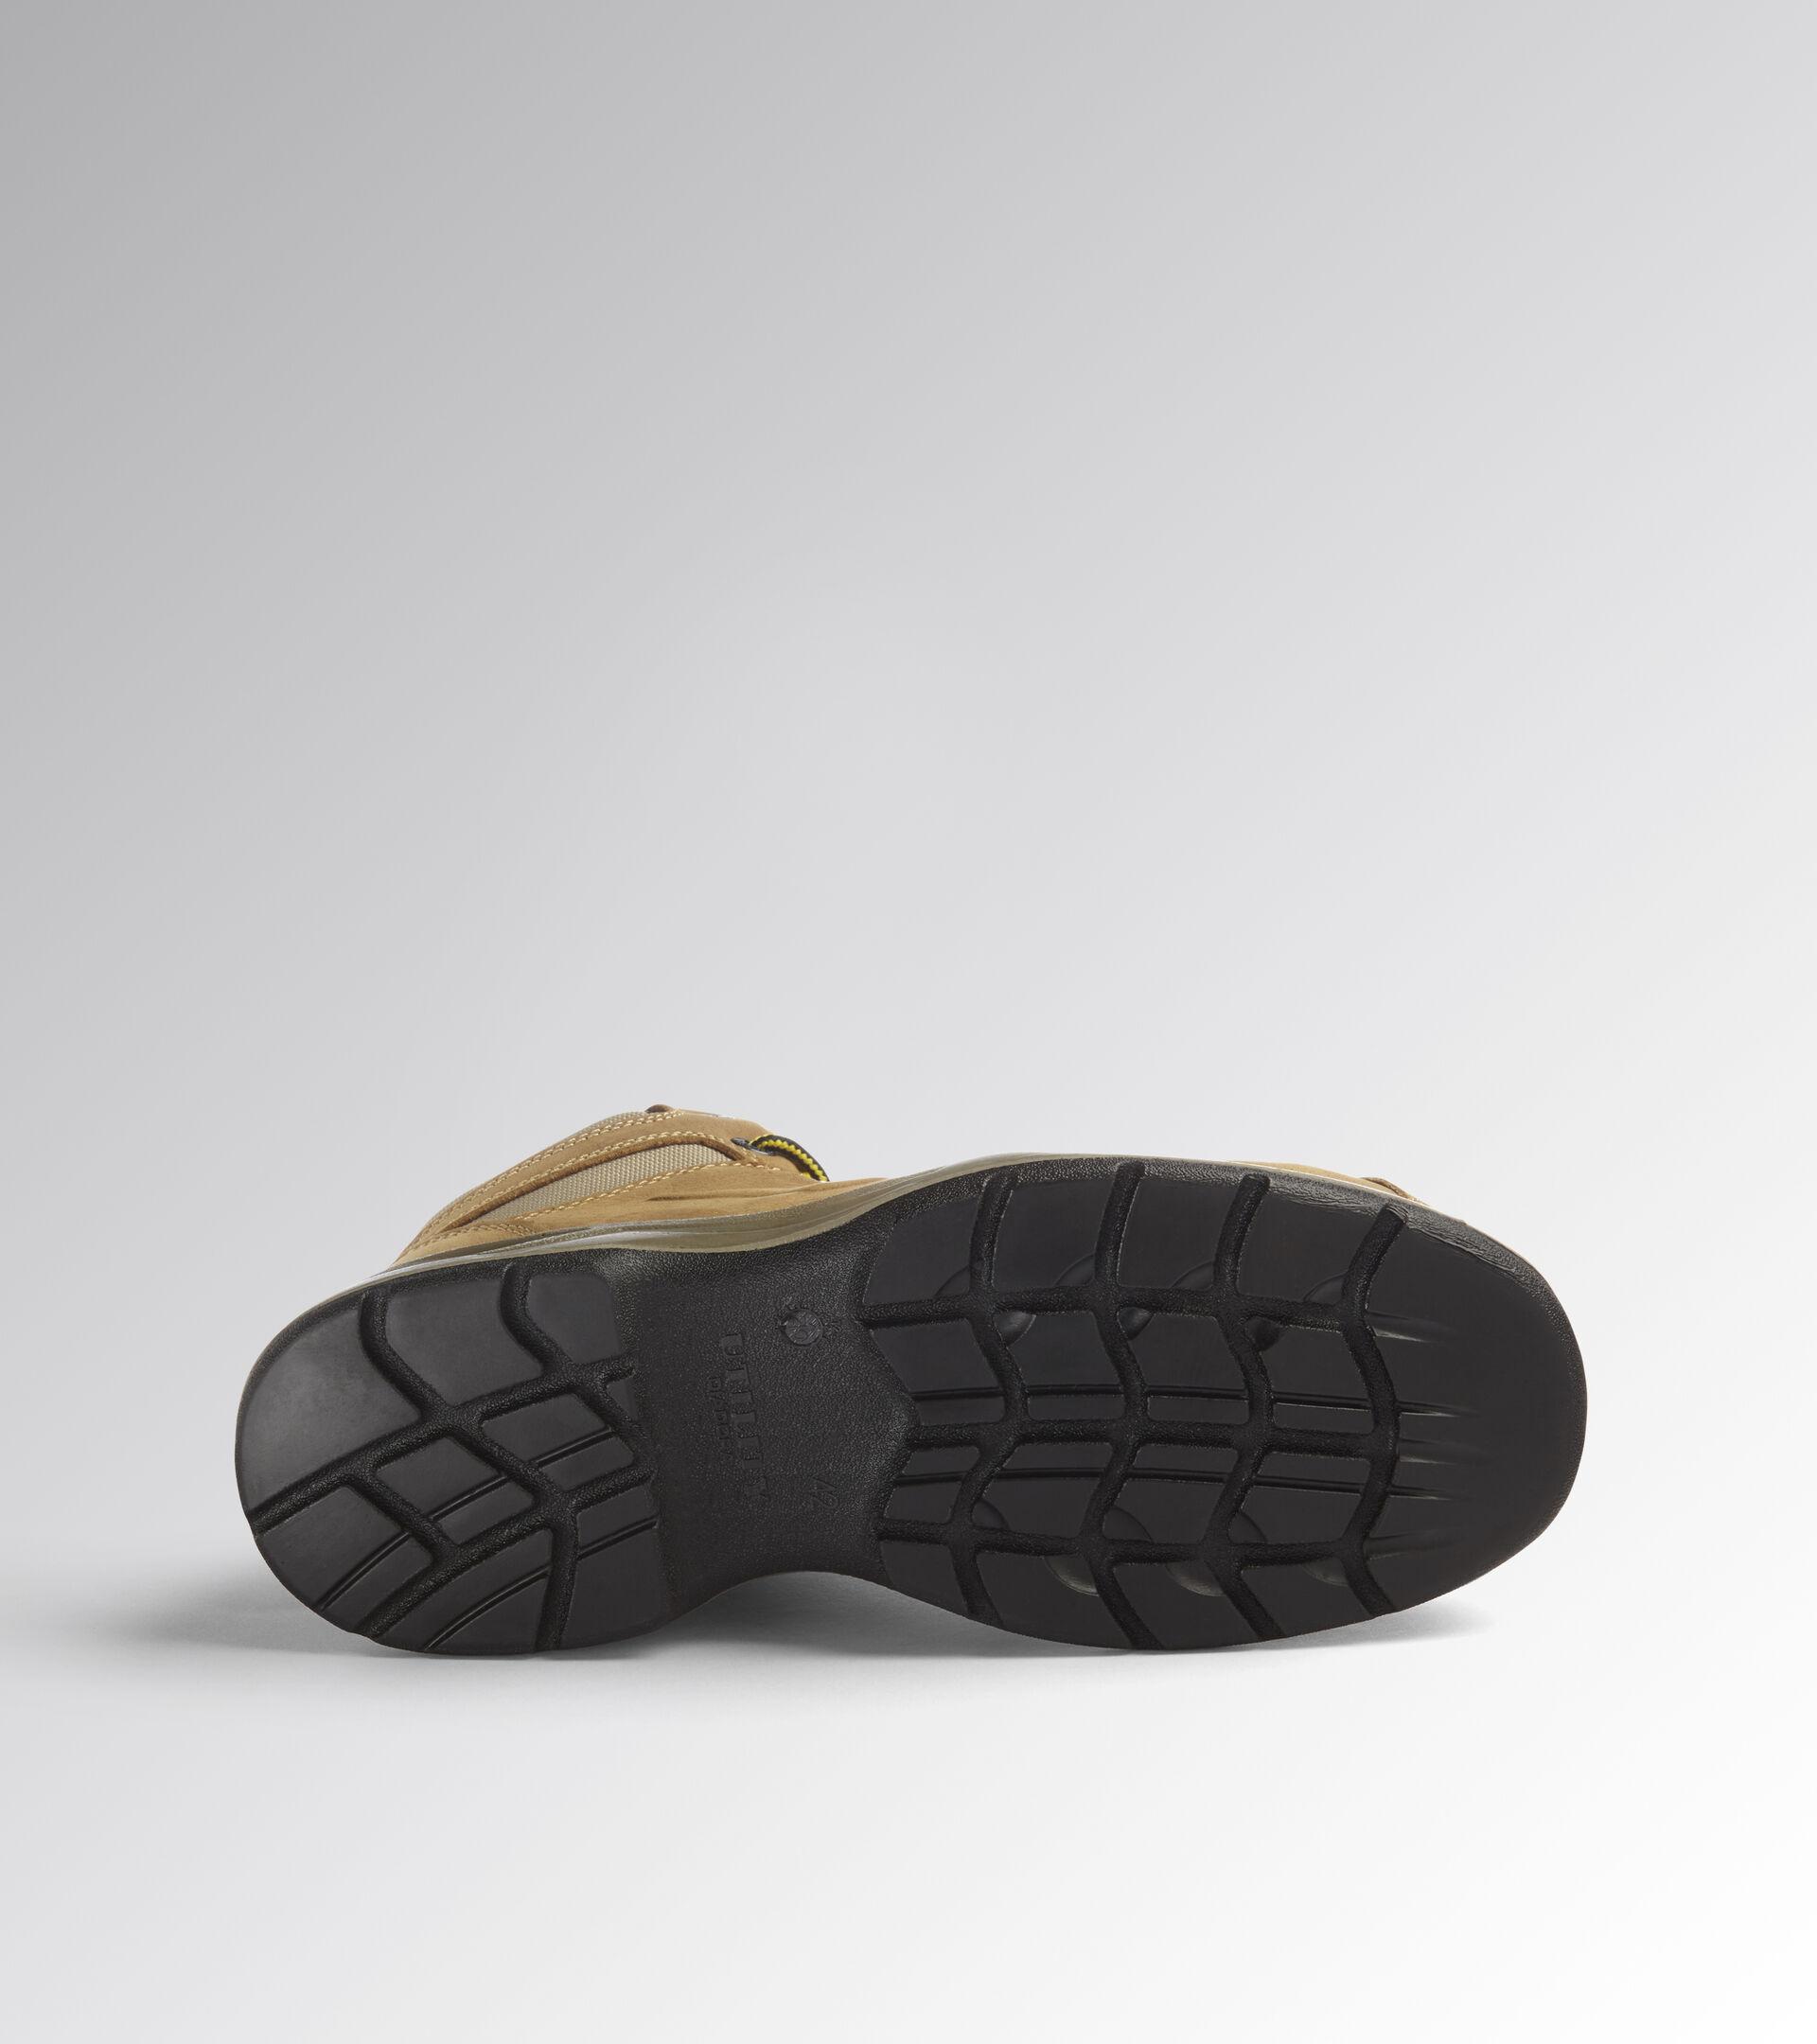 Footwear Utility UNISEX FLOW MID S3 SRC DARK BROWN (30050) Utility